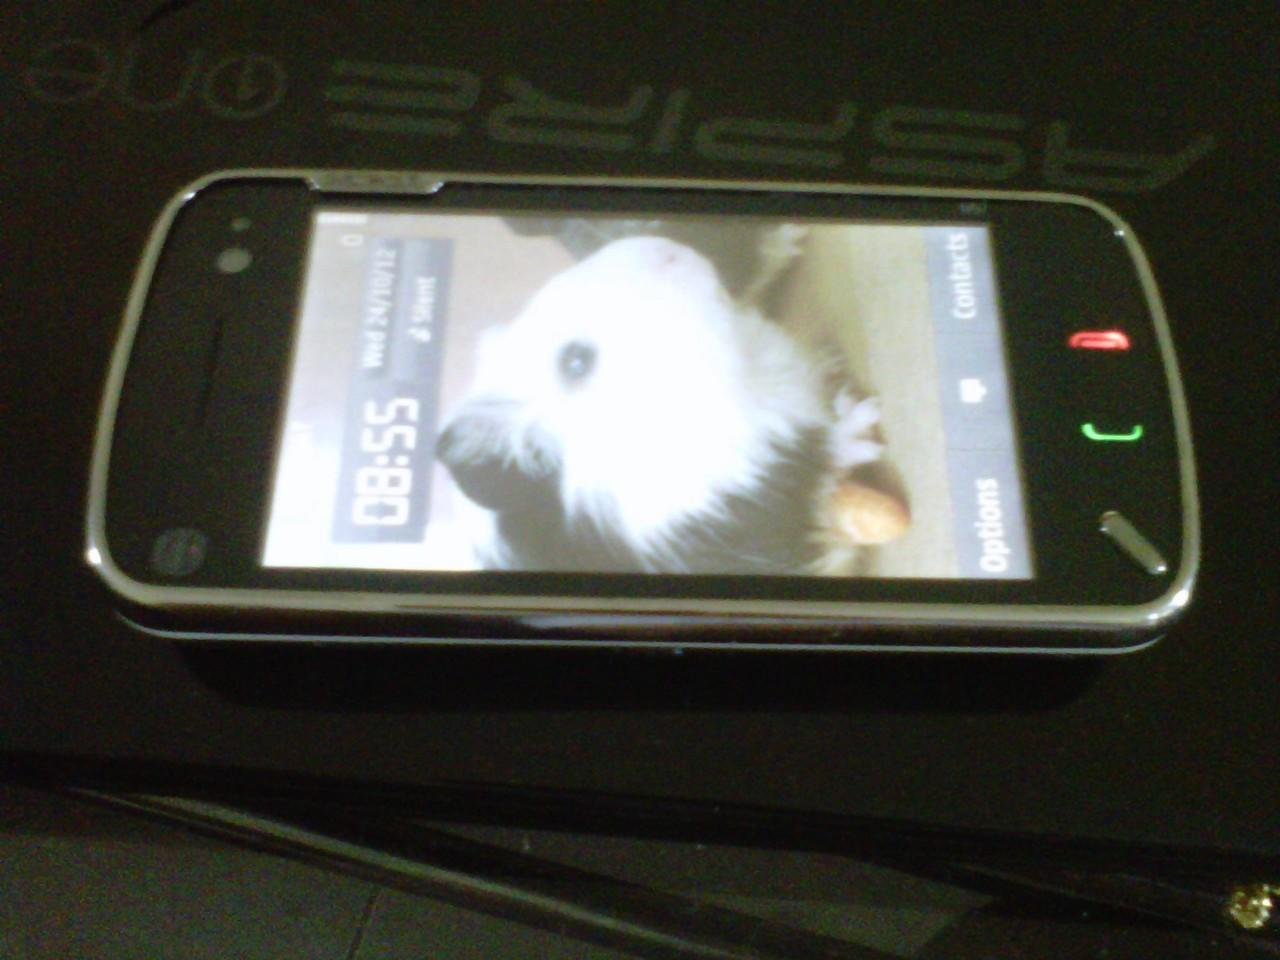 nokia N97 black 32GB bandung